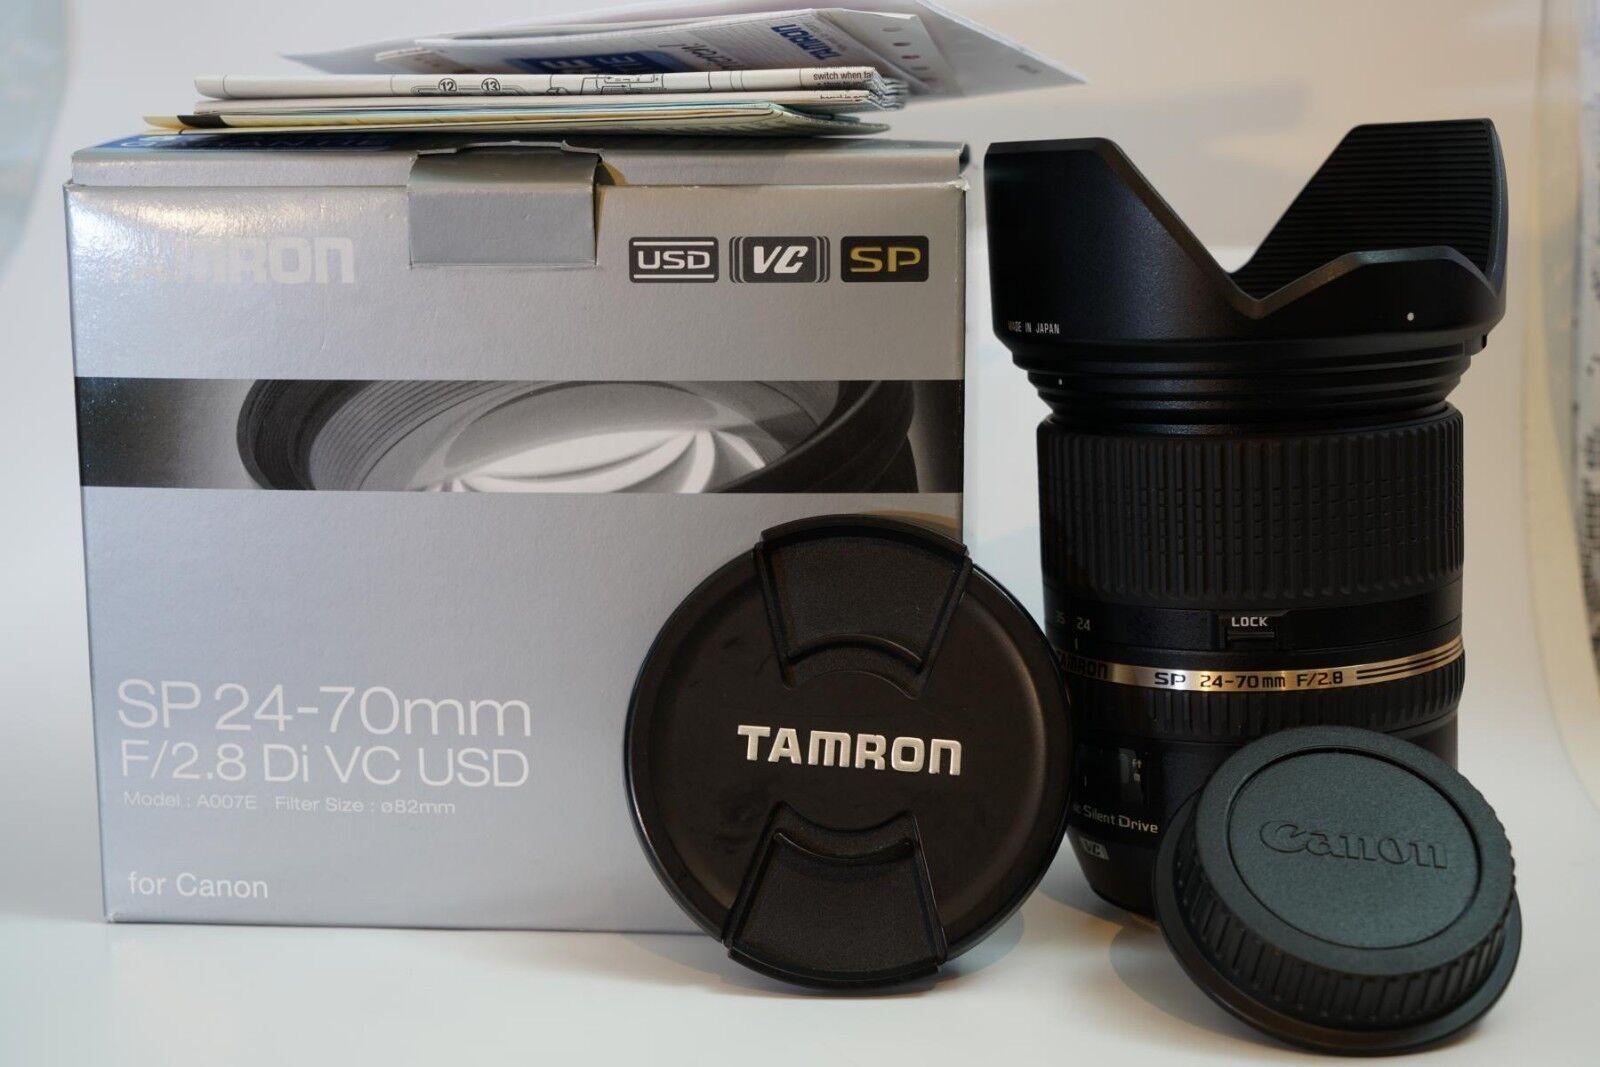 Tamron SP 24-70 mm F/2.8 SP Di VC USD Objektiv für Canon (EF und EF-S)